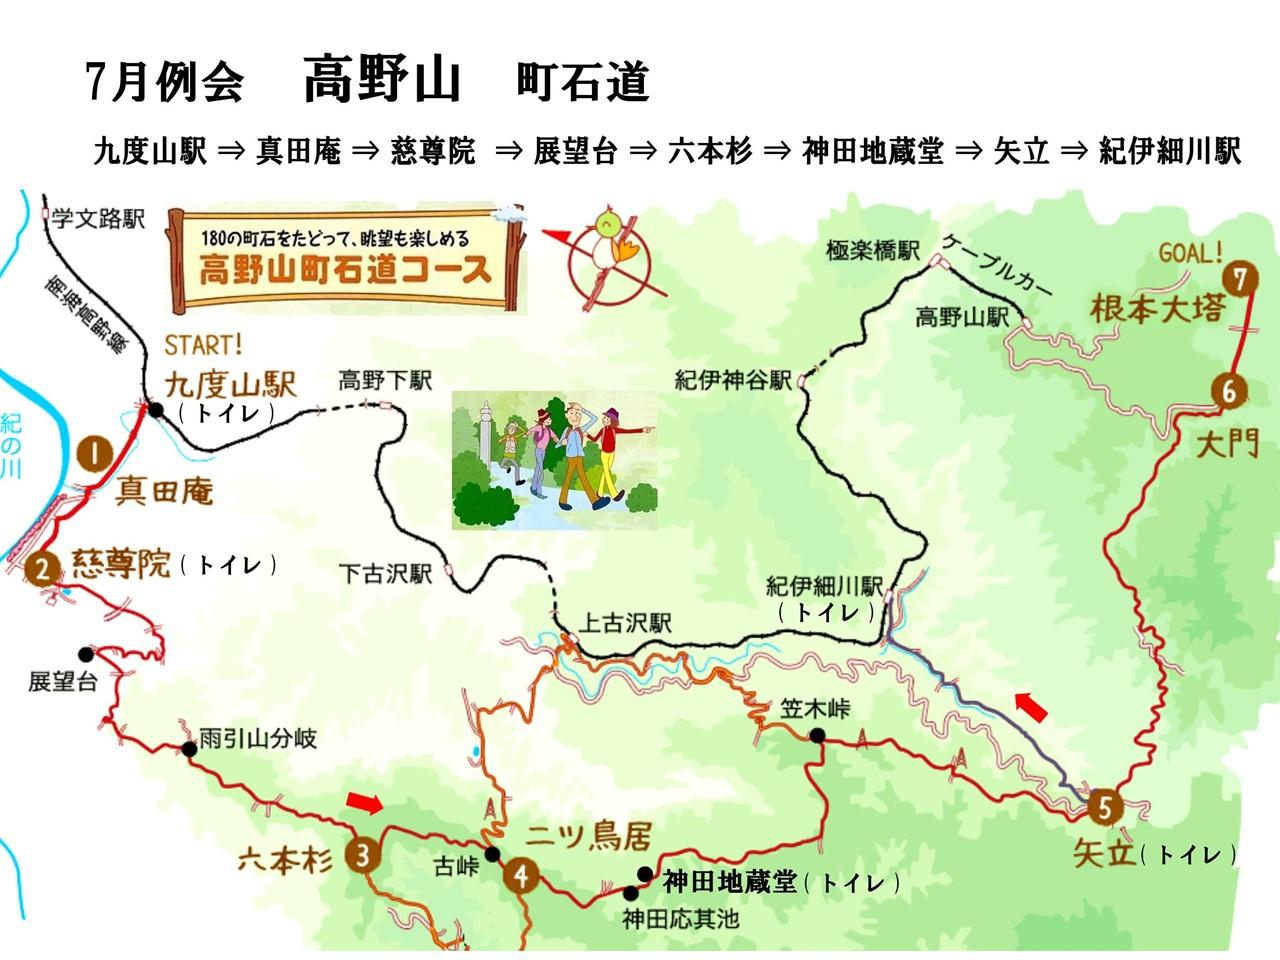 01a 高野山町石道マップ